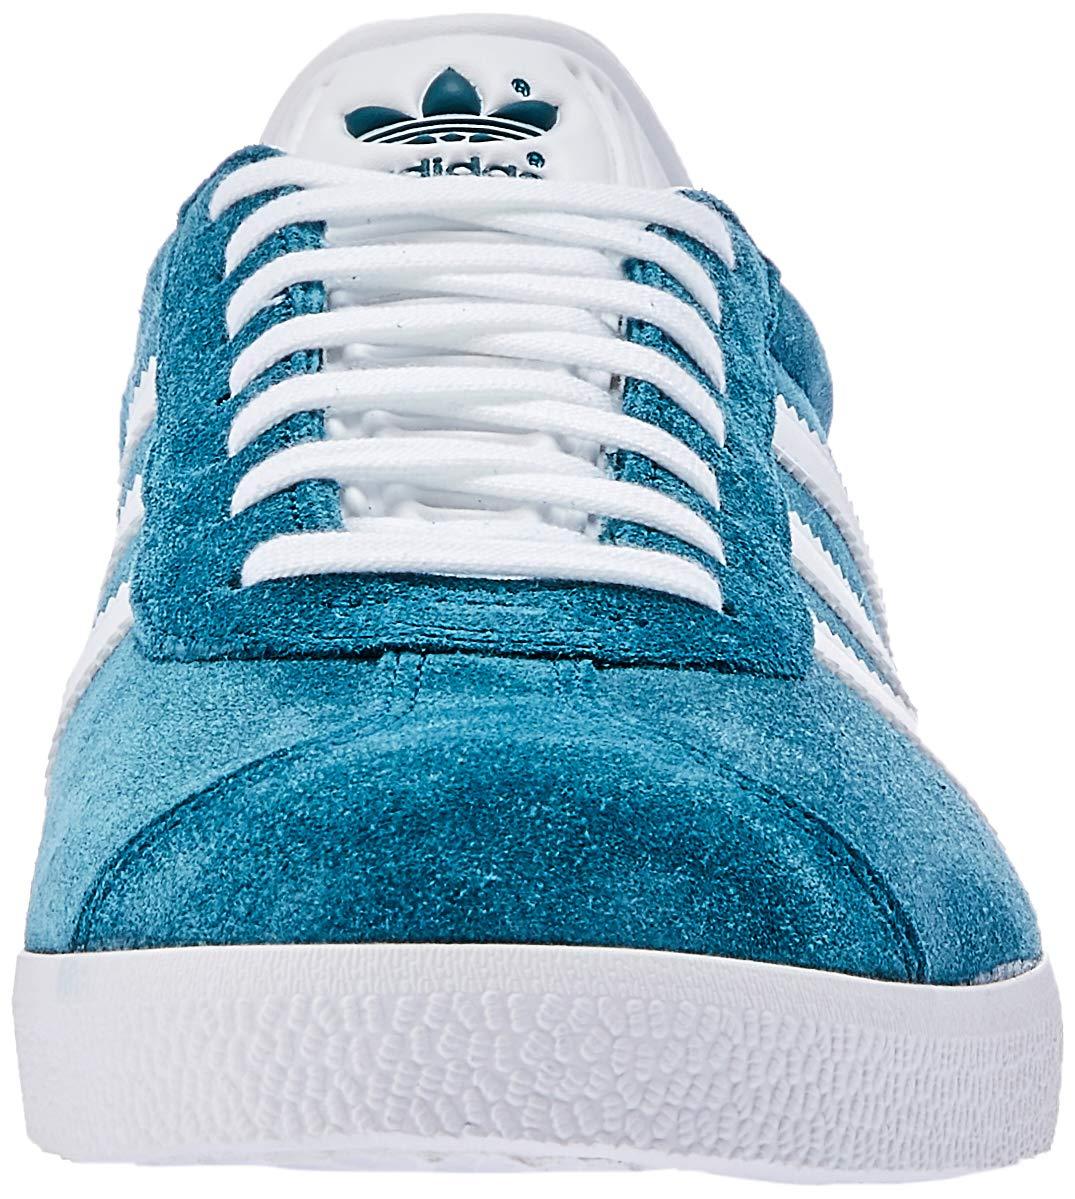 GazelleScarpe Spesavip – Adidas Uomo Da Fitness 3A4LRj5